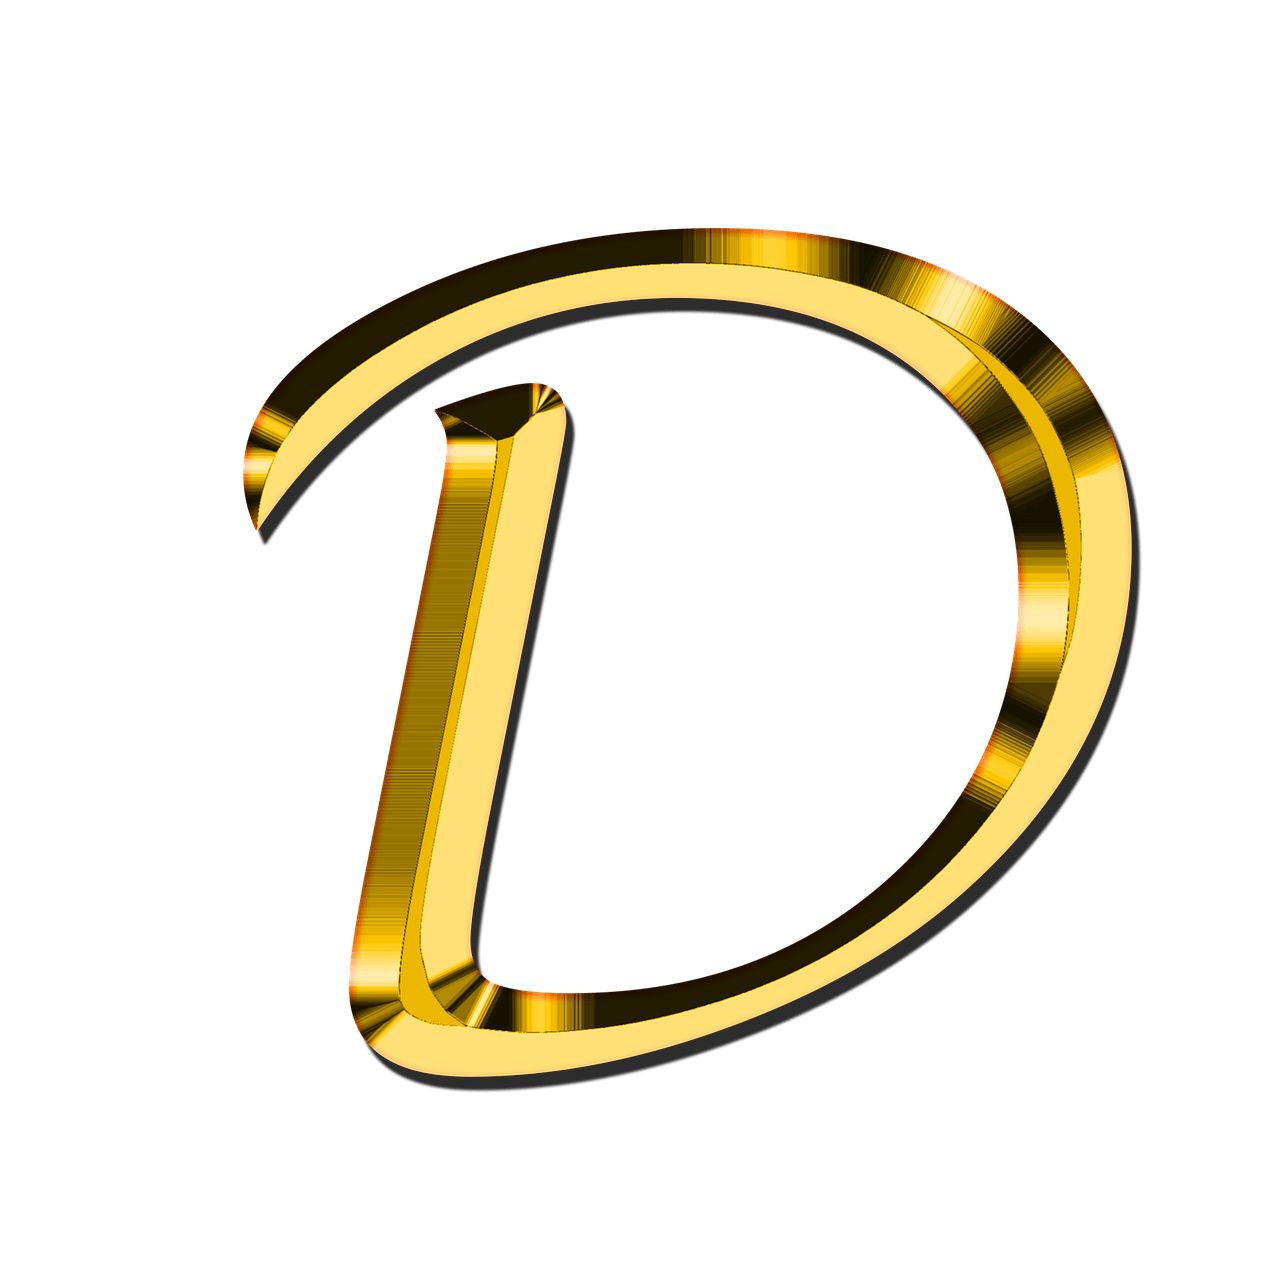 Capital Letter D Transparent Png Stickpng